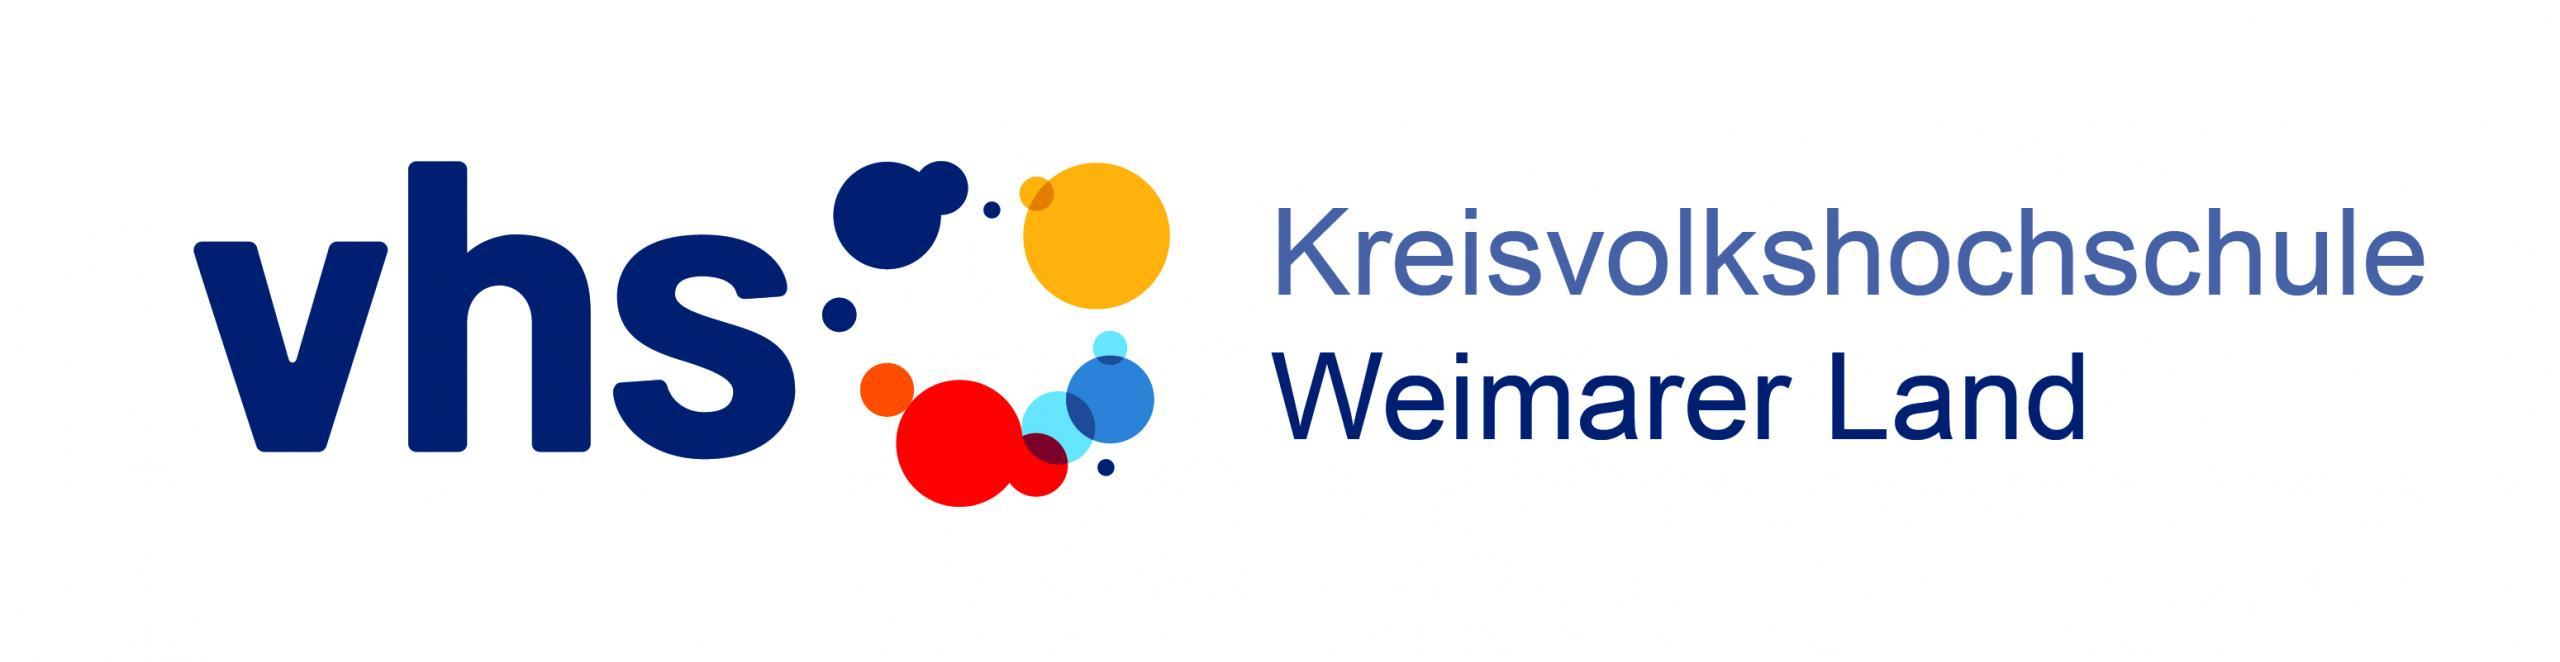 logokvhsweland ver © Kreisvolkshochschule Weimarer Land